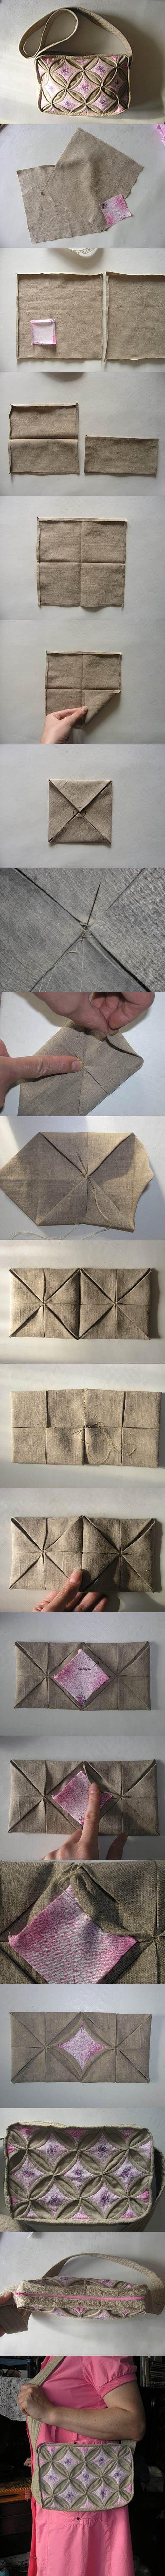 DIY Origami Style Handbag | iCreativeIdeas.com Like Us on Facebook ==> https://www.facebook.com/icreativeideas